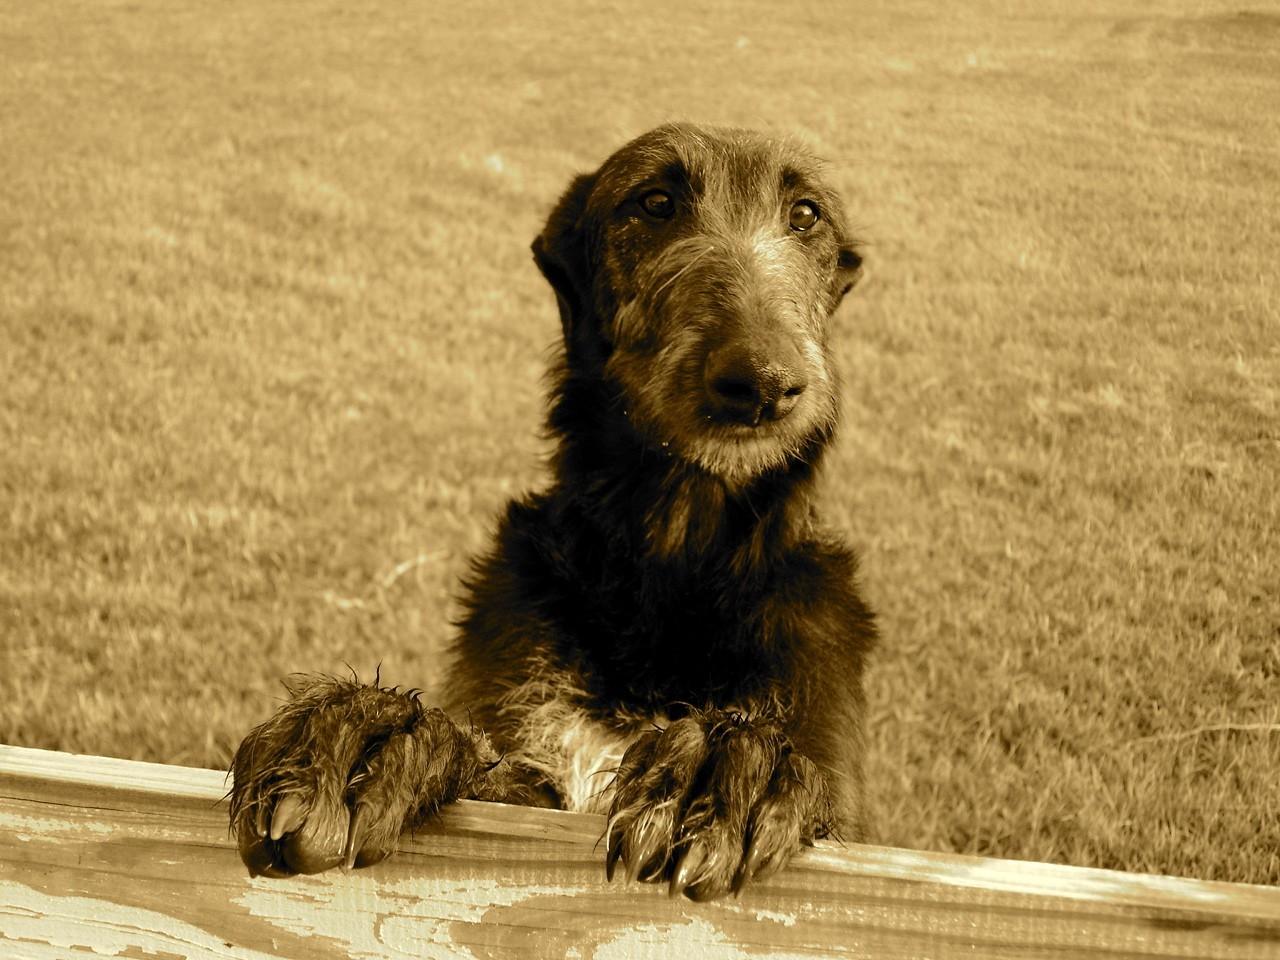 Cute Beagle Puppy Wallpaper Funny Scottish Deerhound Dog Photo And Wallpaper